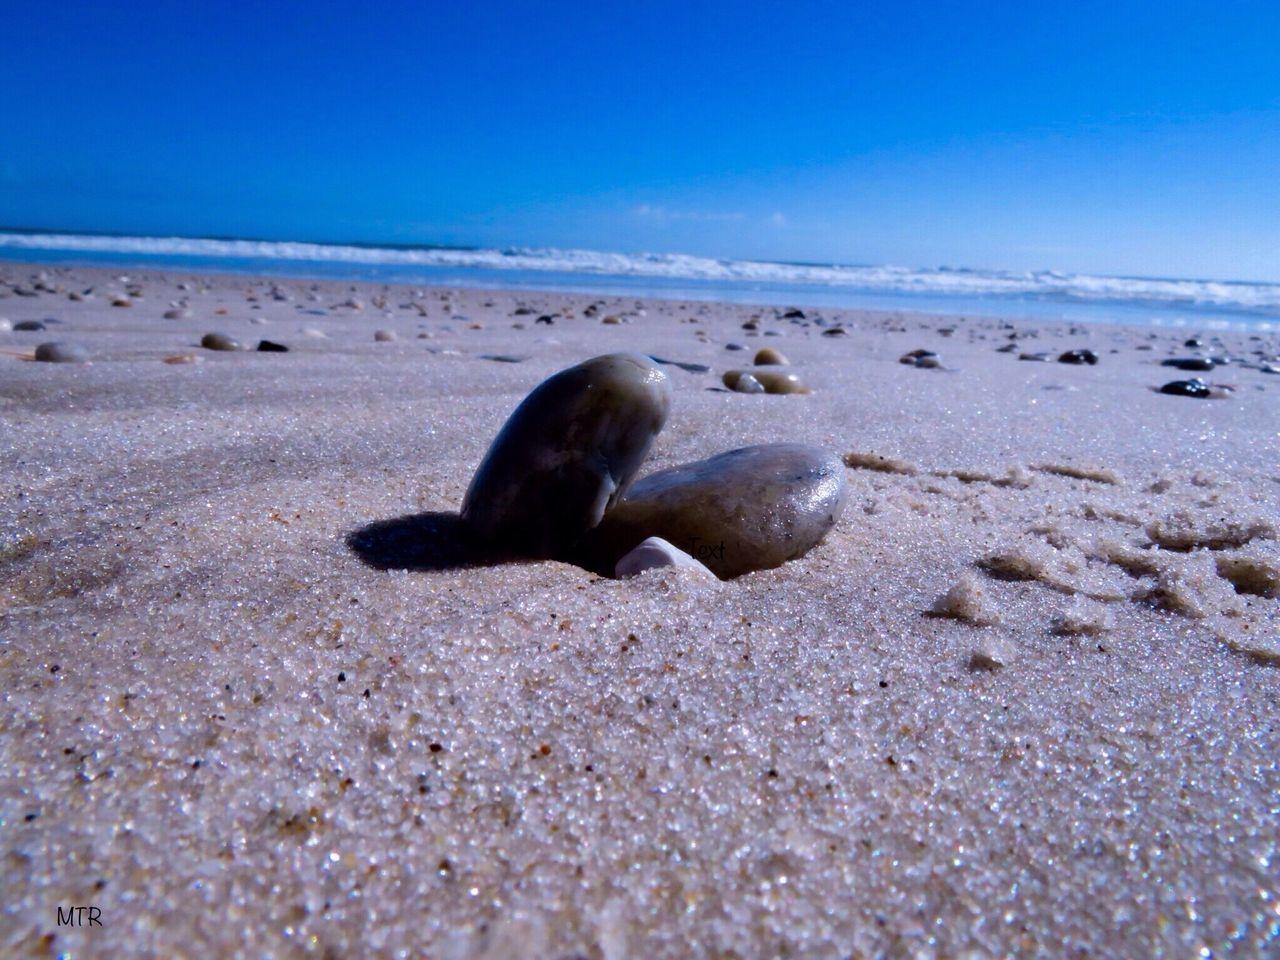 Beach Sea Sand Nature Shore Sea Life No People Outdoors Summers Fireislandnationalseashore LongIslandNY SouthShore Beach Smithpoint Beach